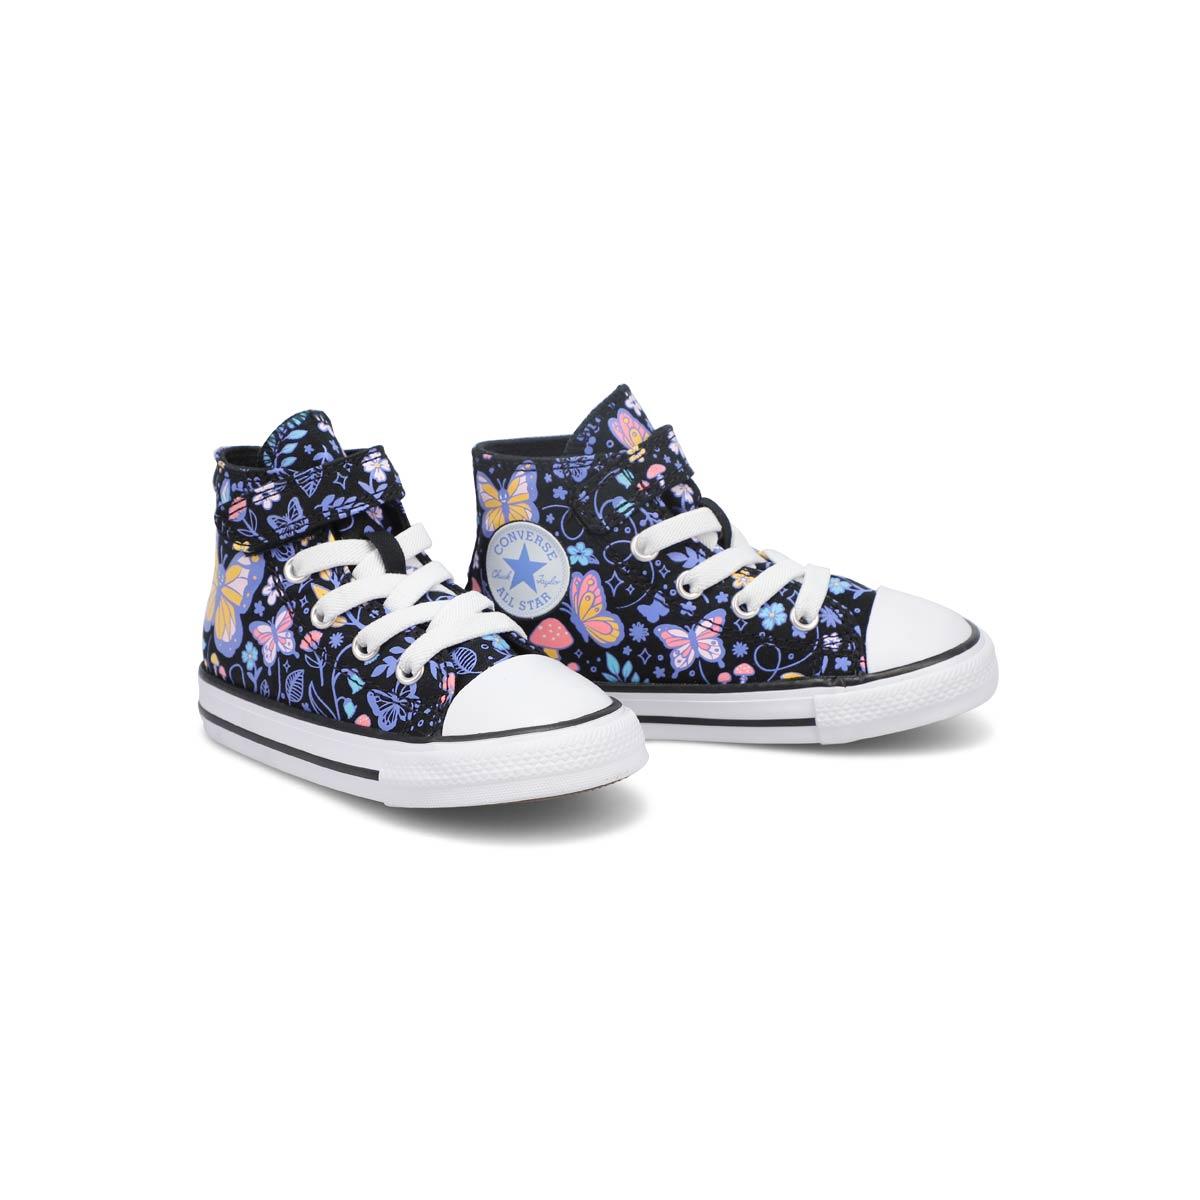 Infants' All Star 1V Butterfly Fun - Black/Multi